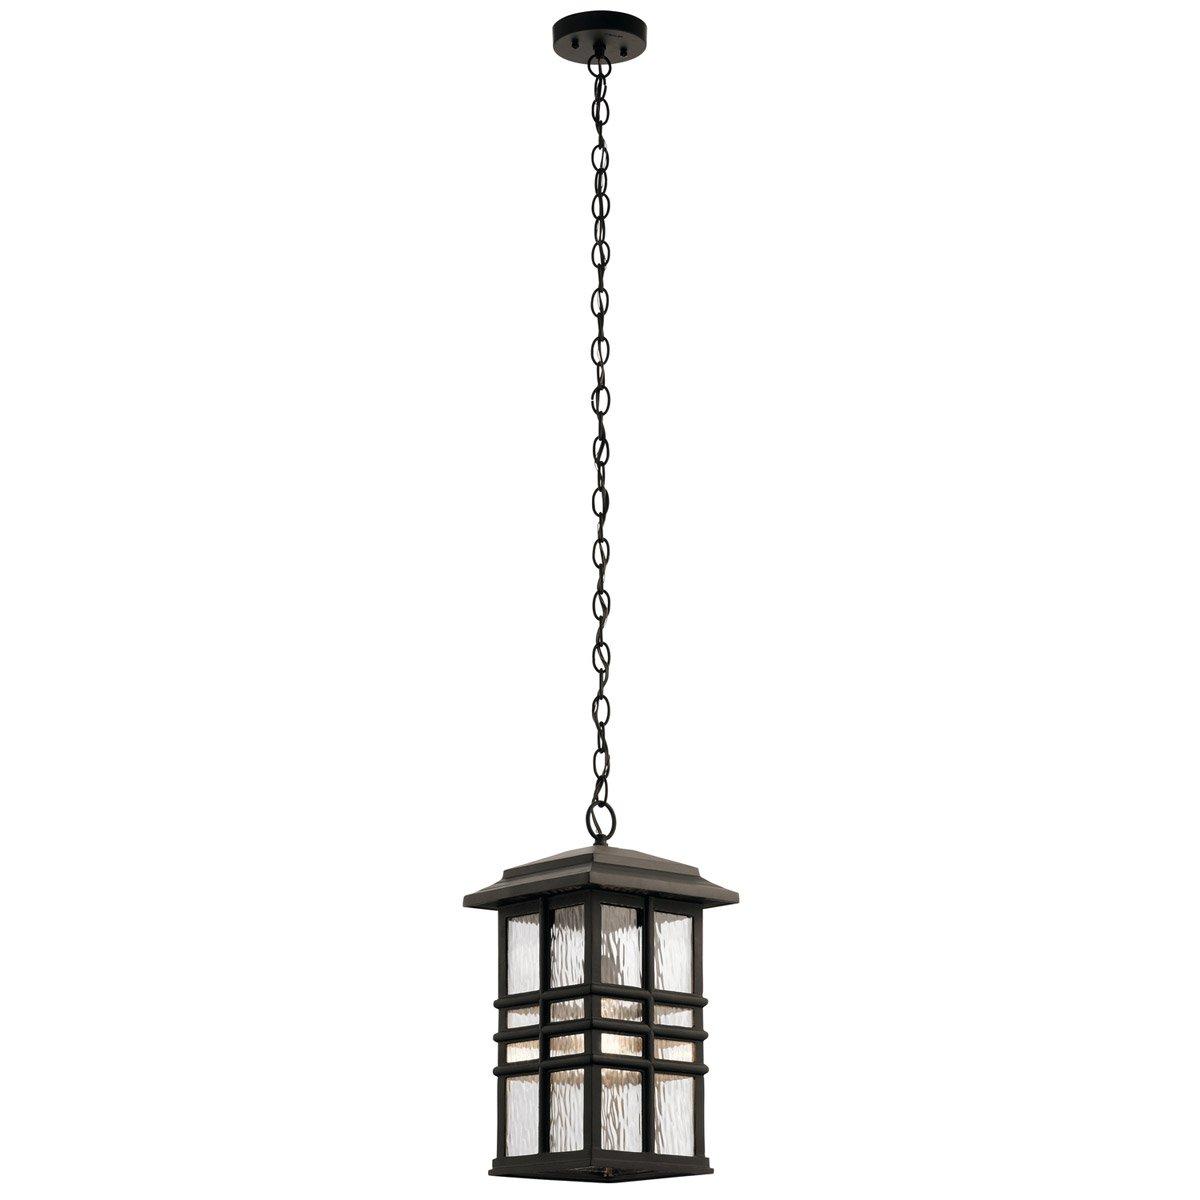 Kichler 49833OZ One Light Outdoor Pendant